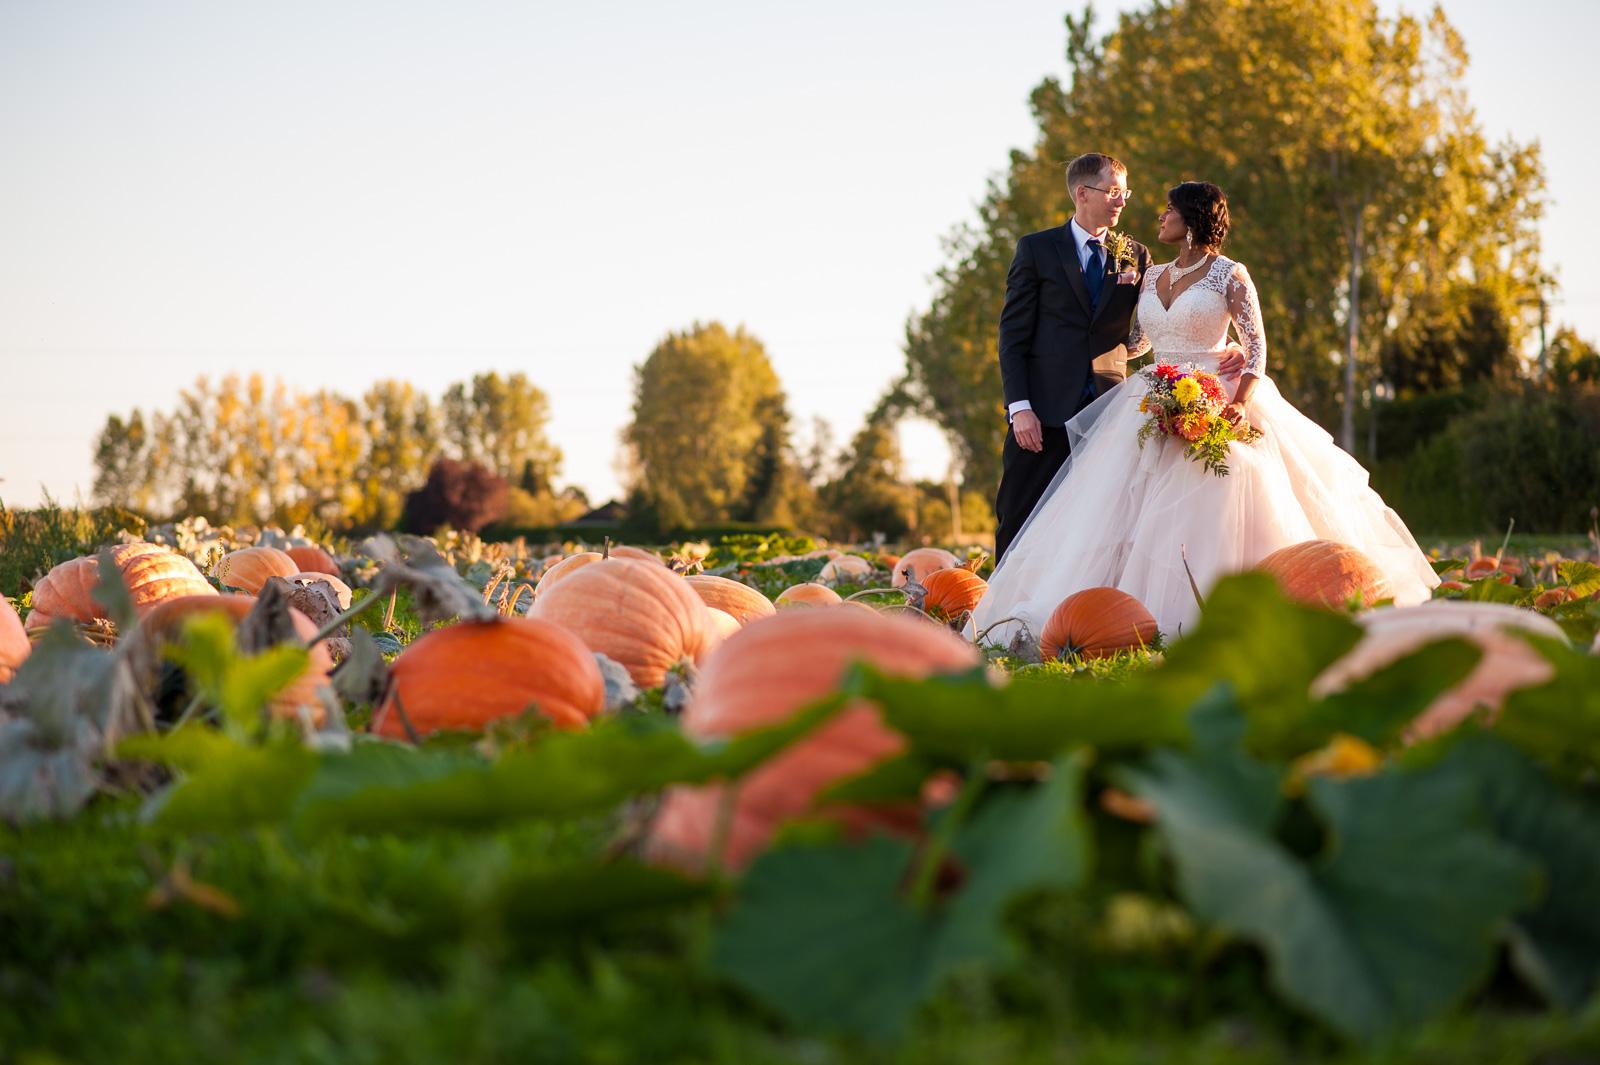 bc-wedding-photographers-paradise-banquet-hall-wedding-27.jpg